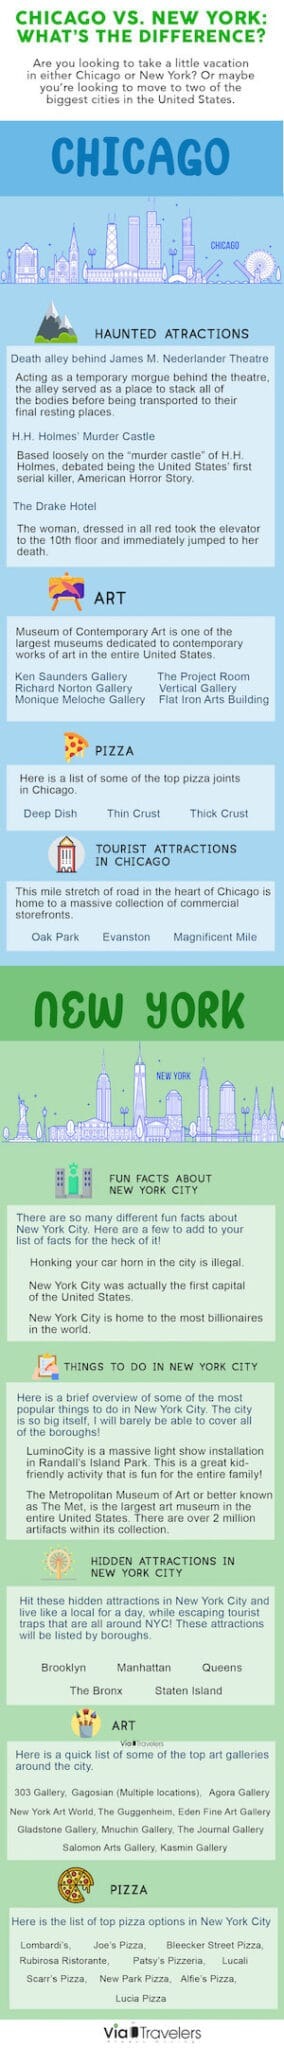 Chicago vs New York City Infographic